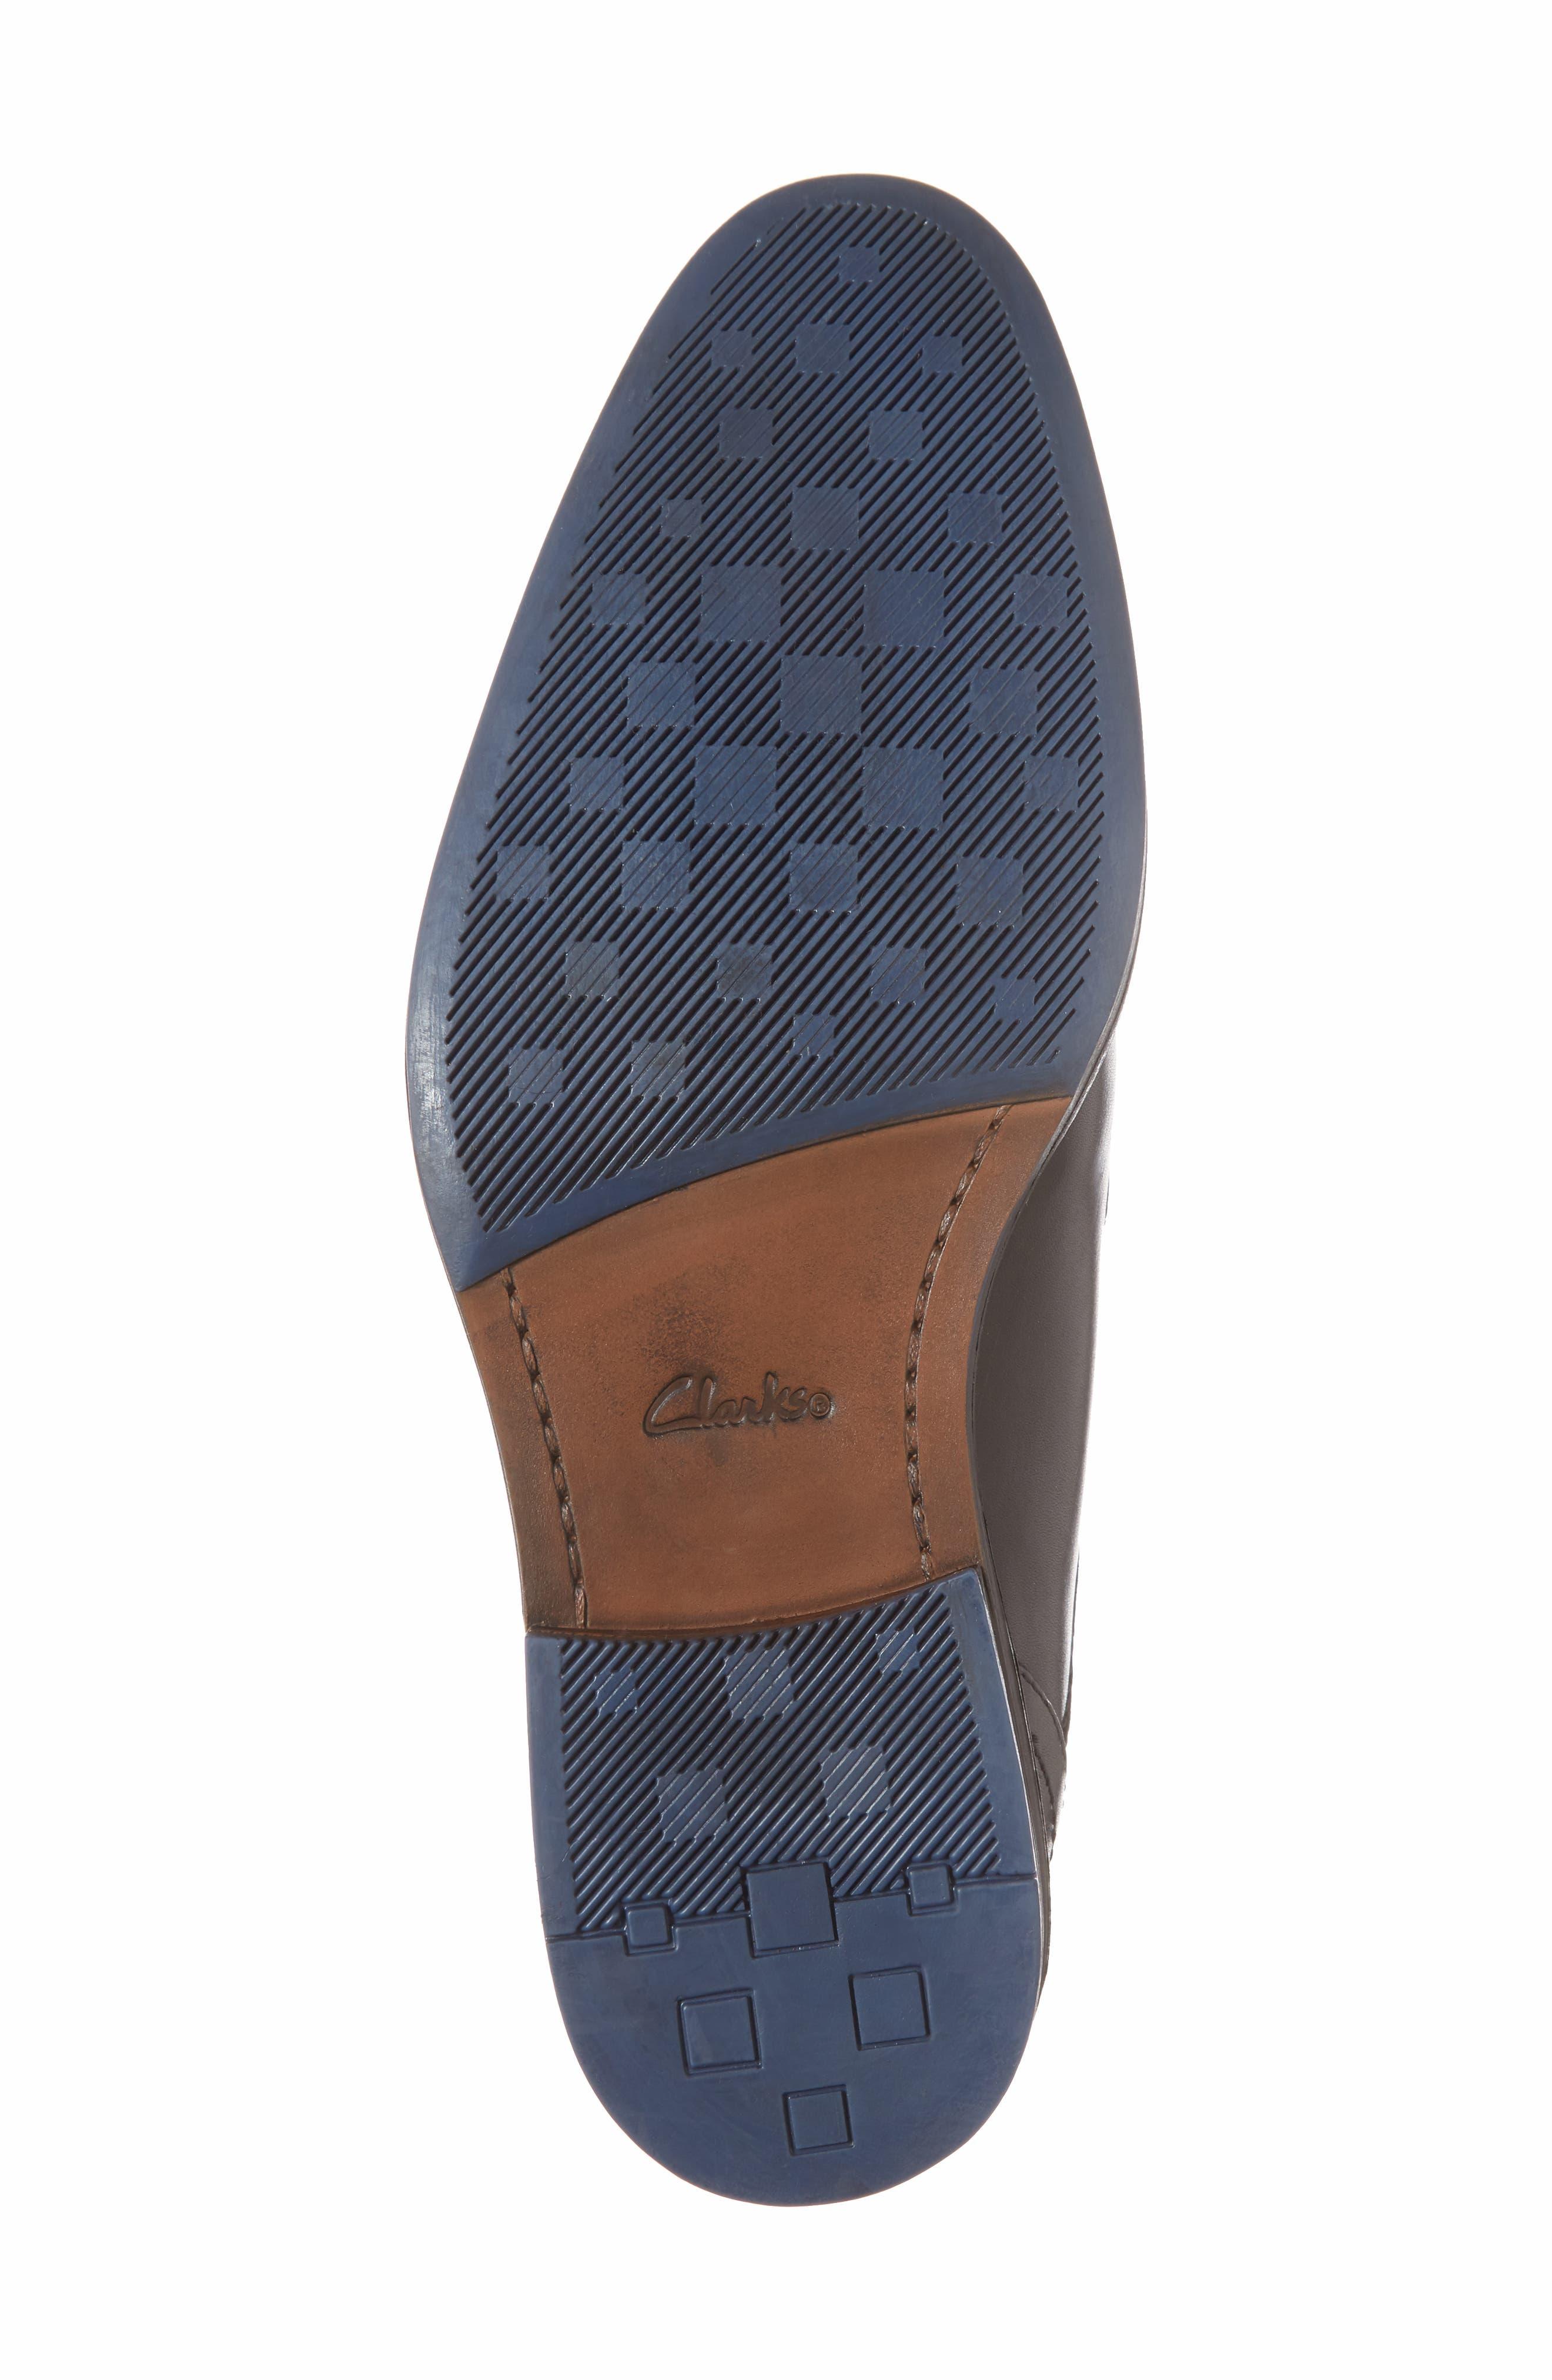 Clarks<sup>®</sup> Prangley Walk Plain Toe Derby,                             Alternate thumbnail 6, color,                             003